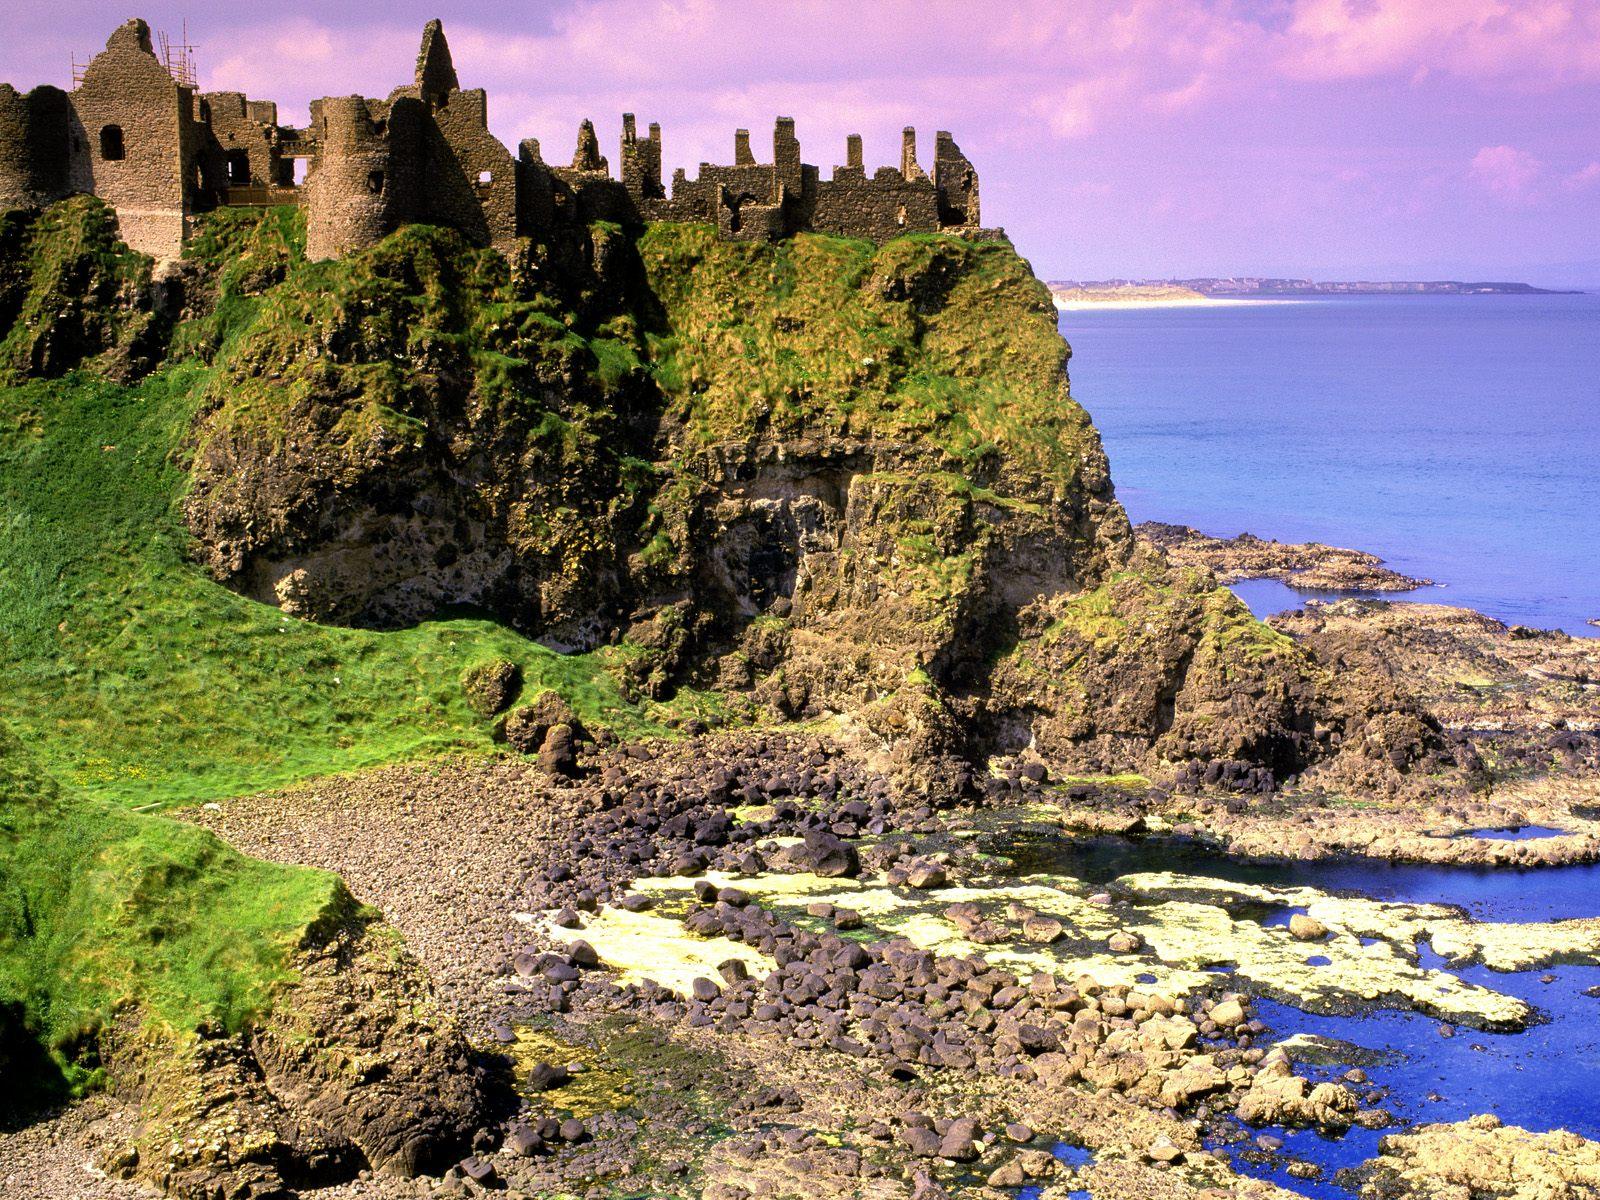 Kilkenny, Ireland Voted One of the Worlds Friendliest